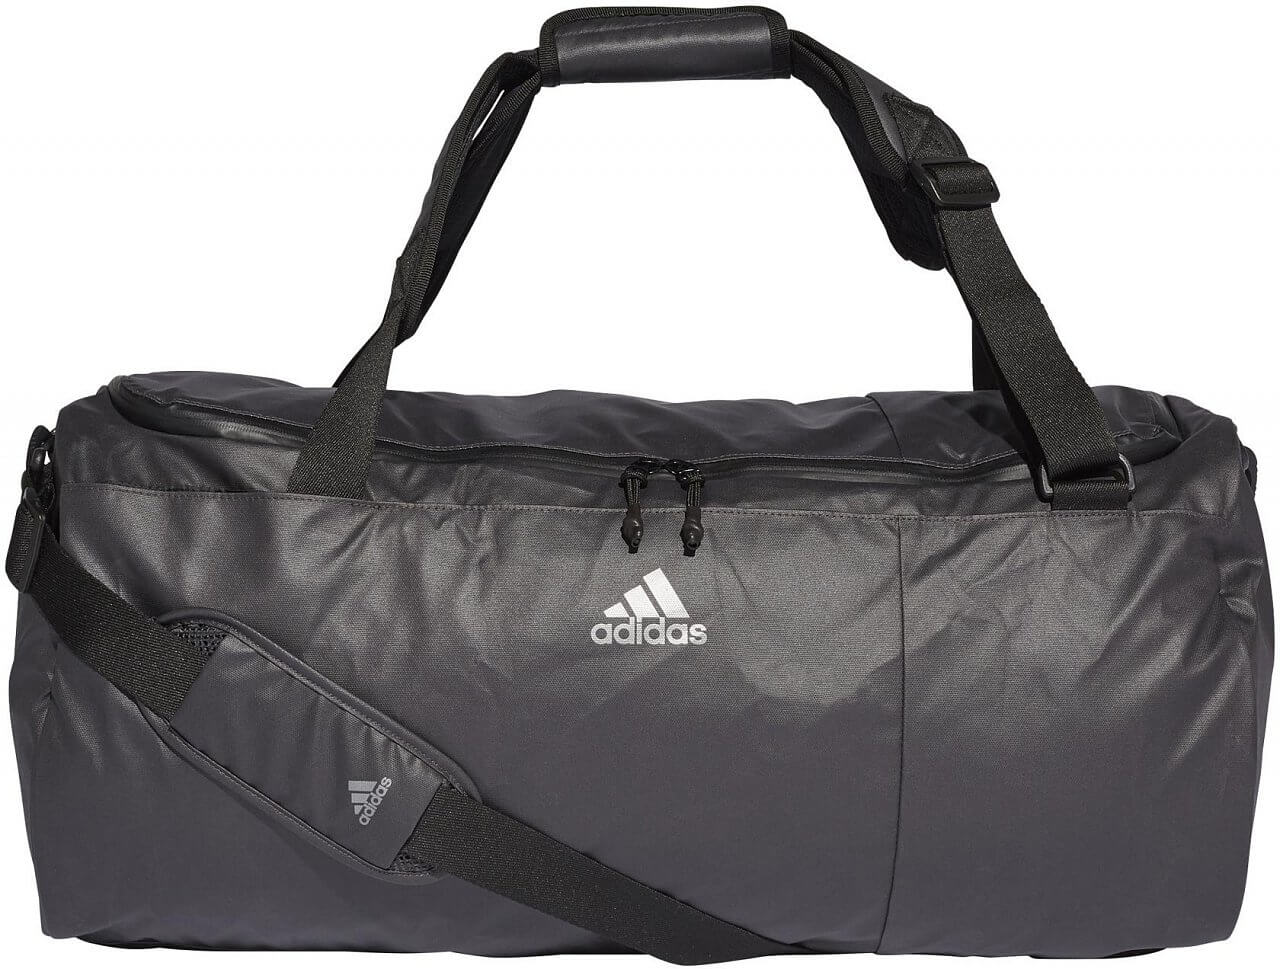 Sportovní taška adidas Convertible Training Duffel Bag